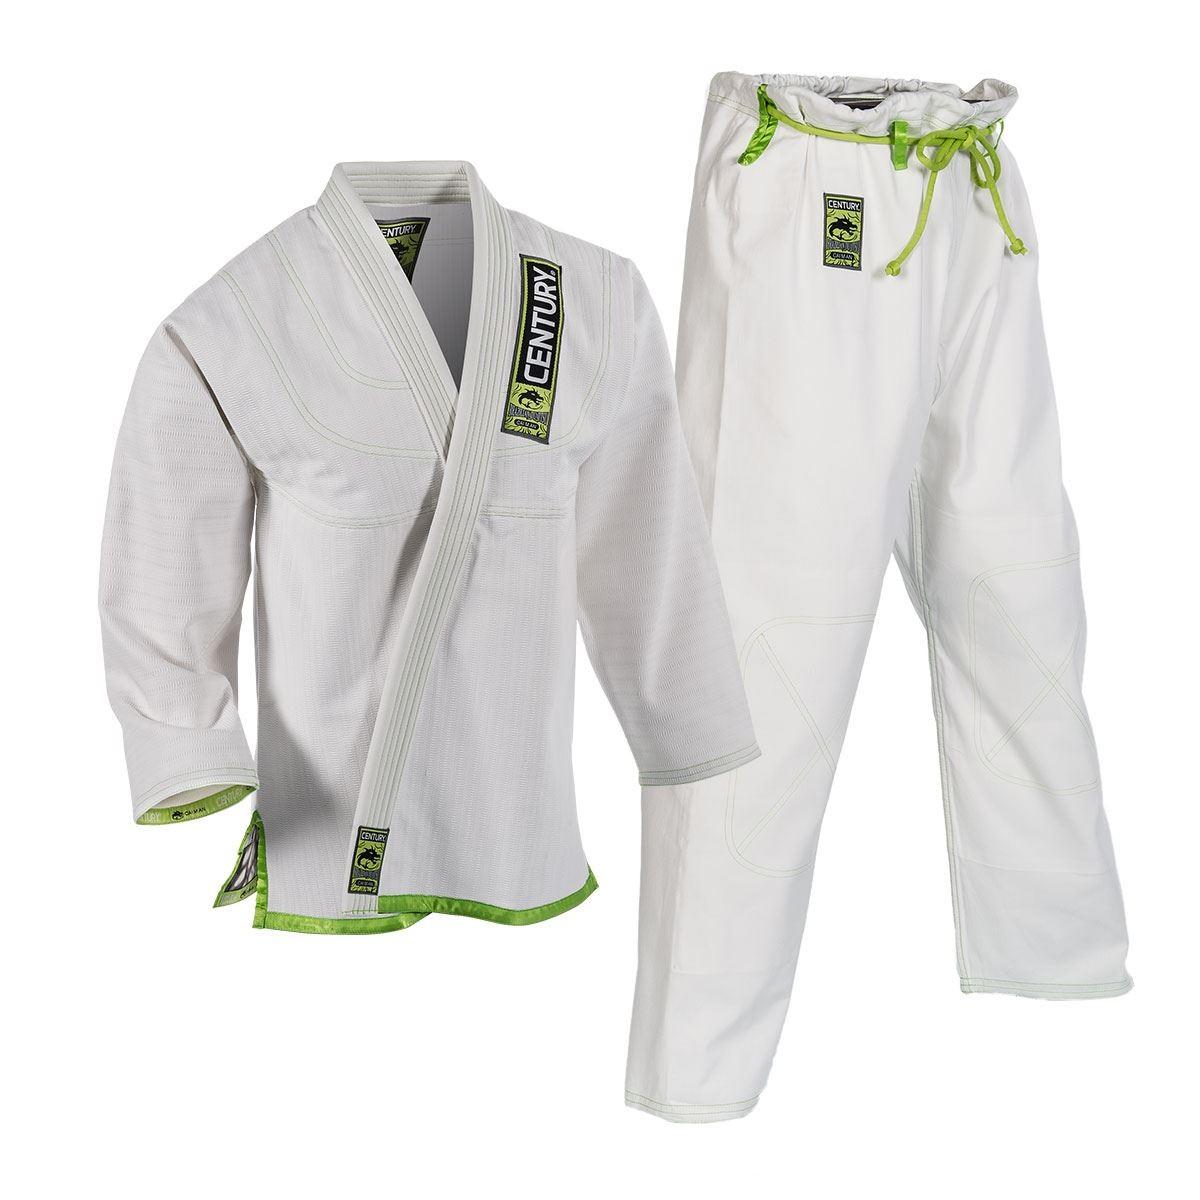 Century Martial Arts Caiman Brazilian Jiu Jitsu Gi Uniform